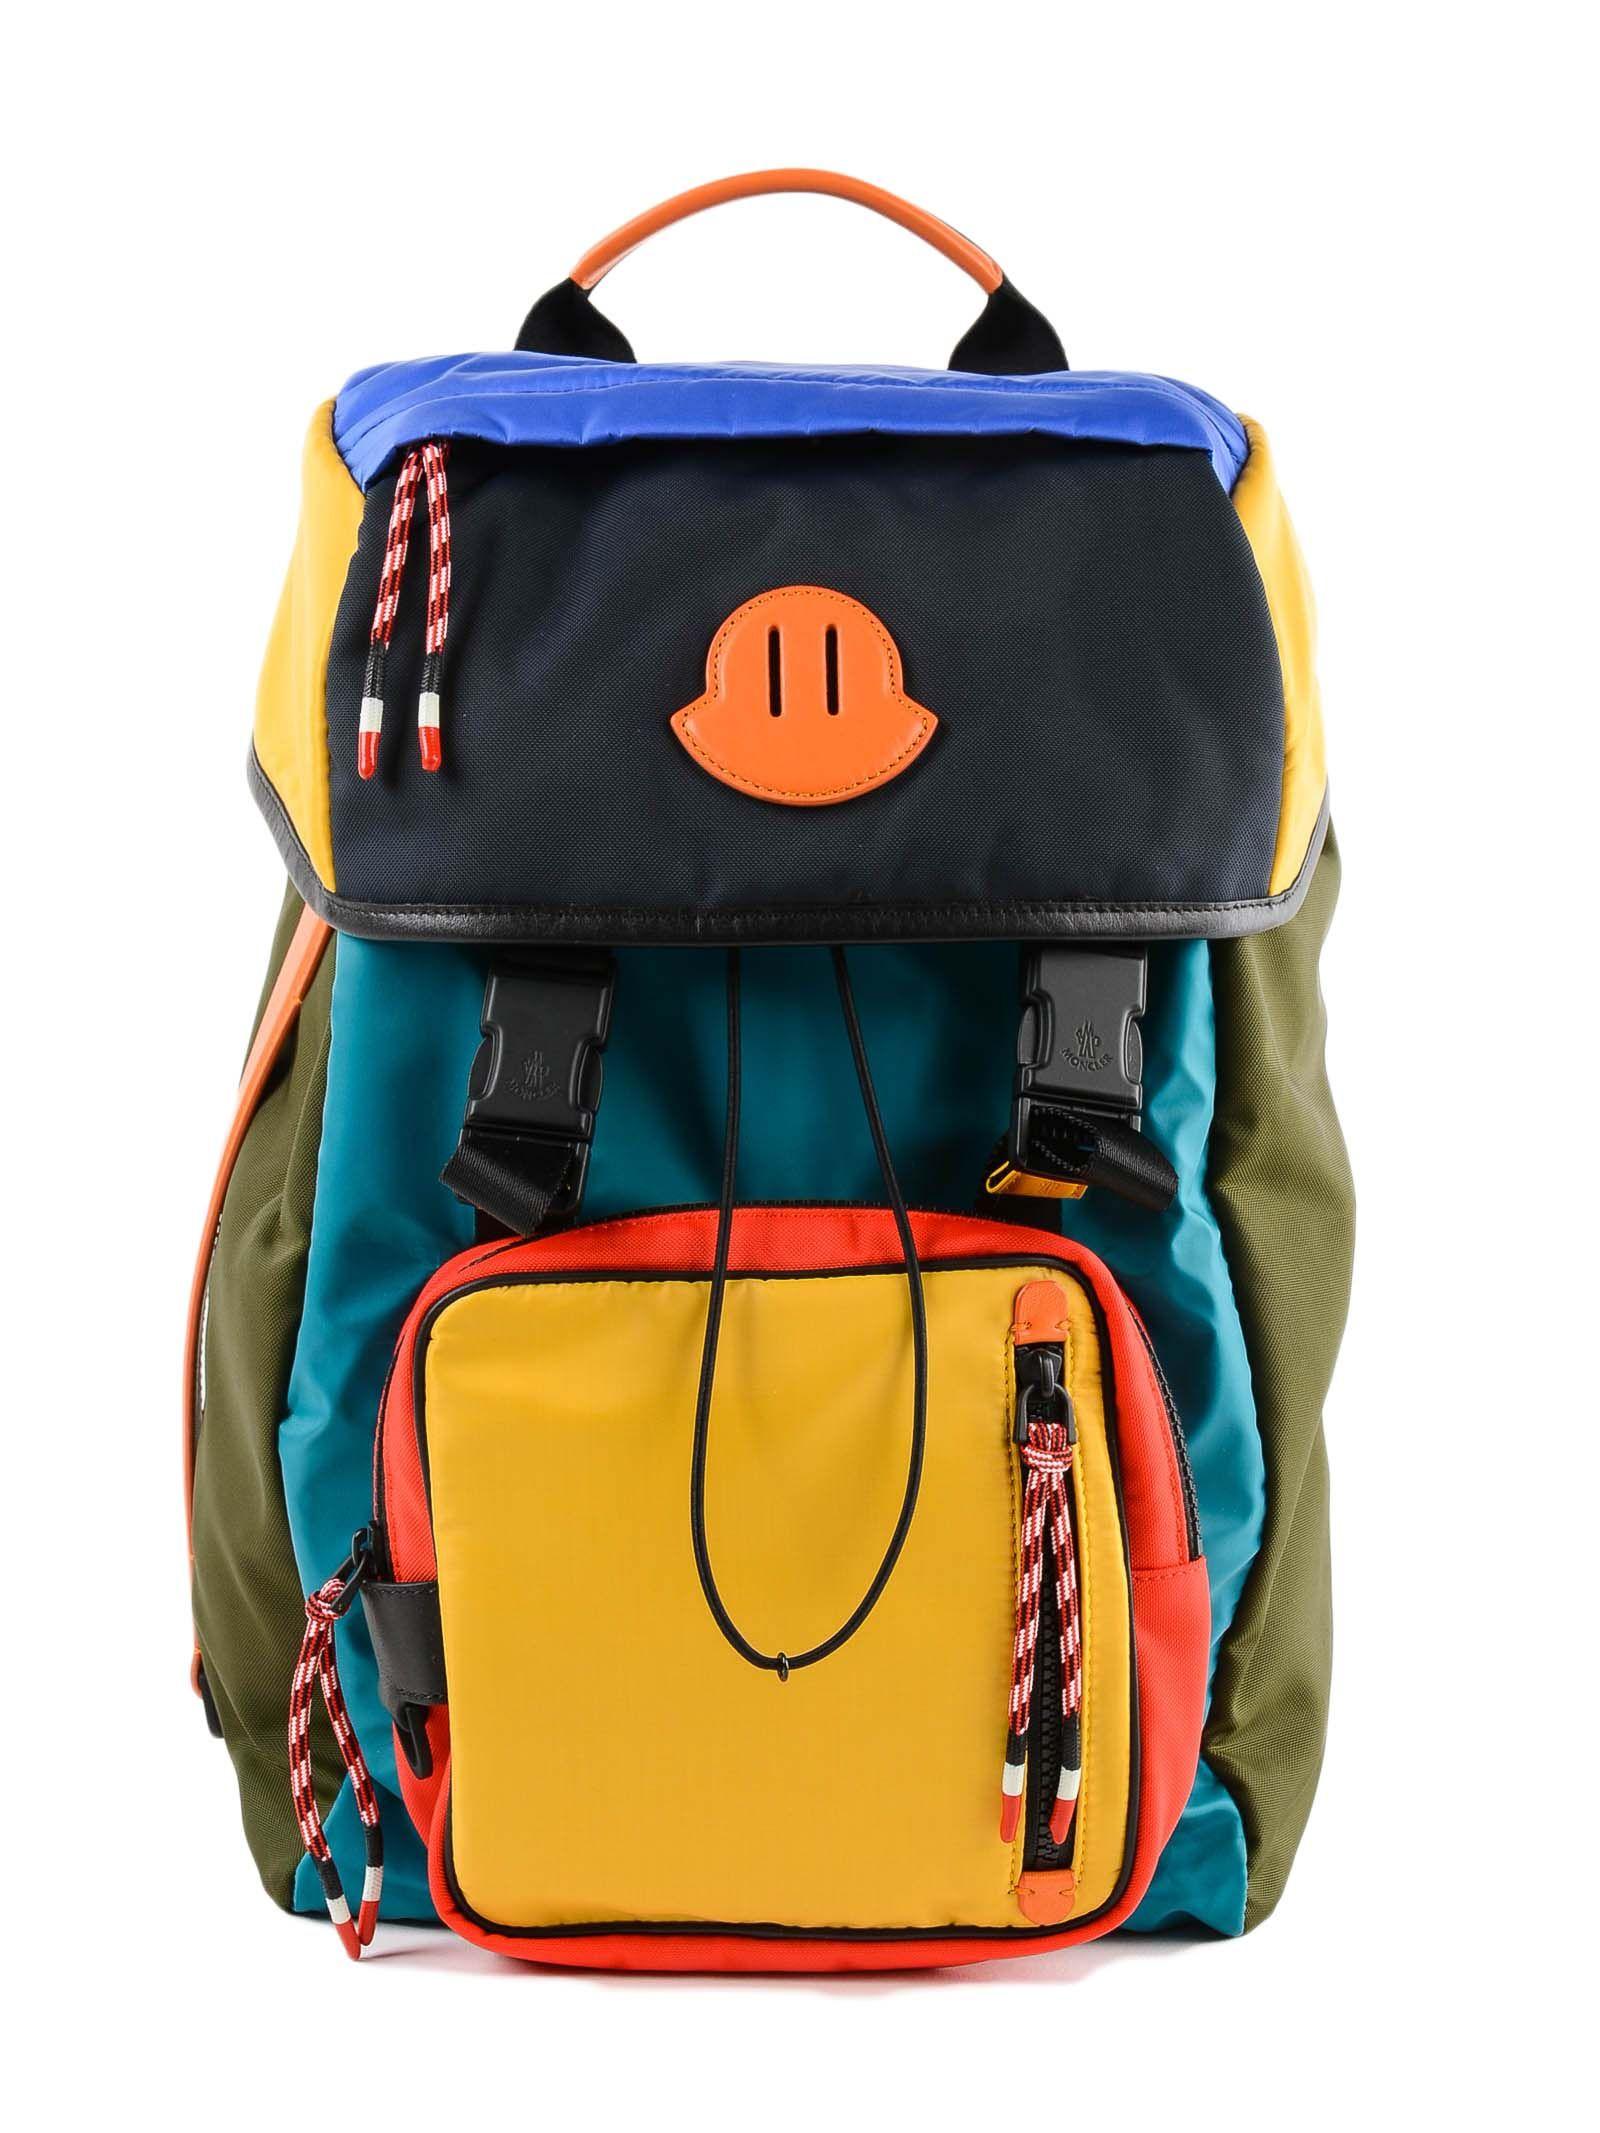 87815c2b0 MONCLER CHUTE MULTICOLOR BACKPACK. #moncler #bags #backpacks ...